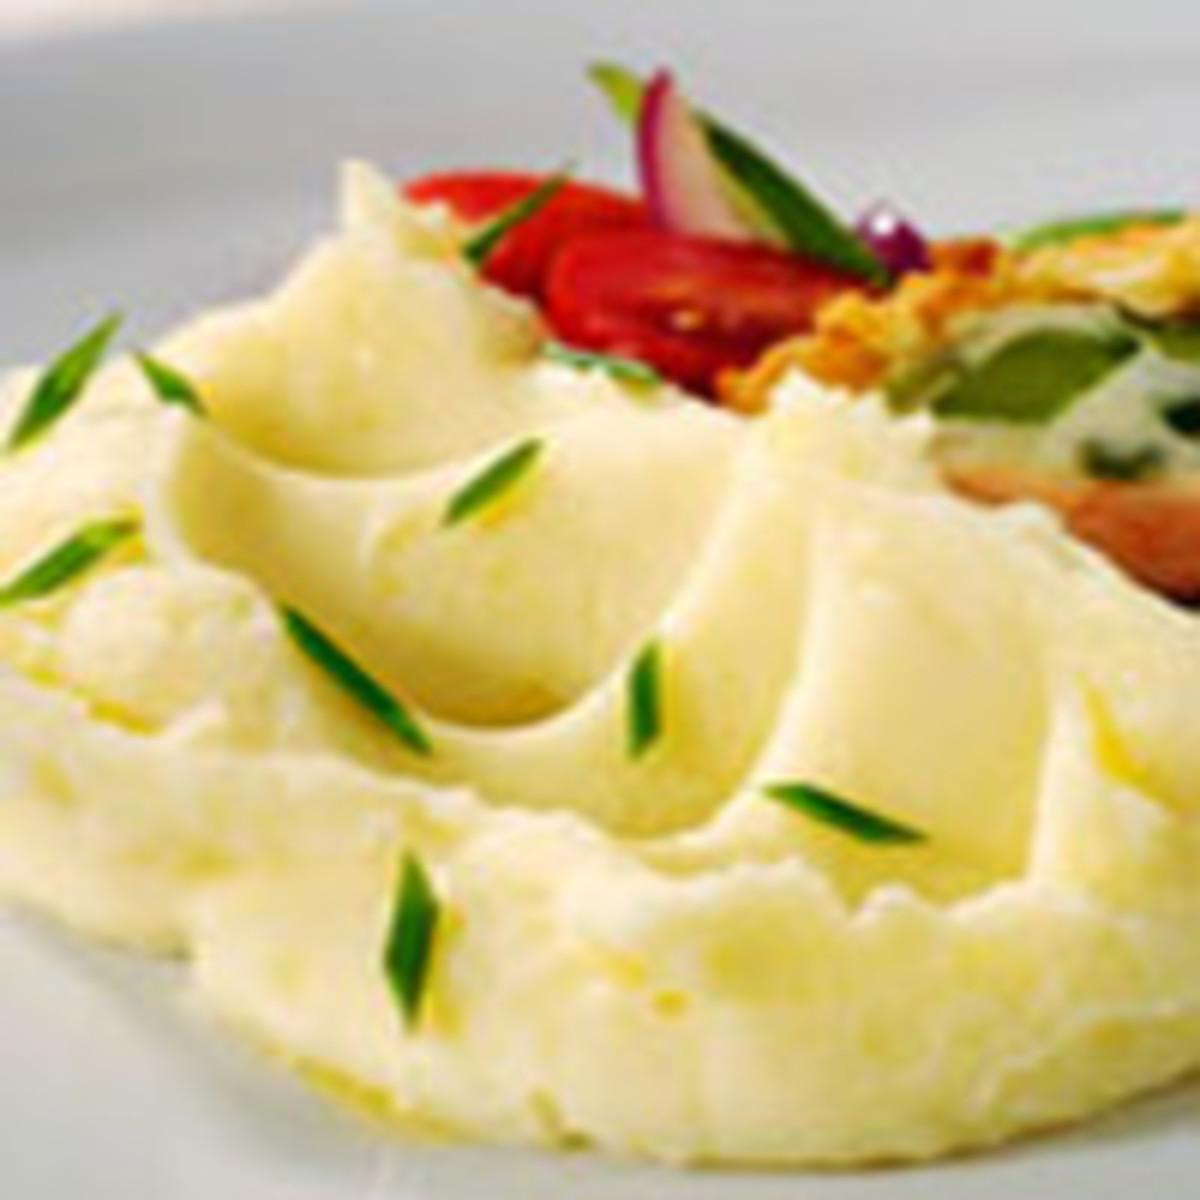 Celery Root, Roasted Garlic Mashed Potatoes